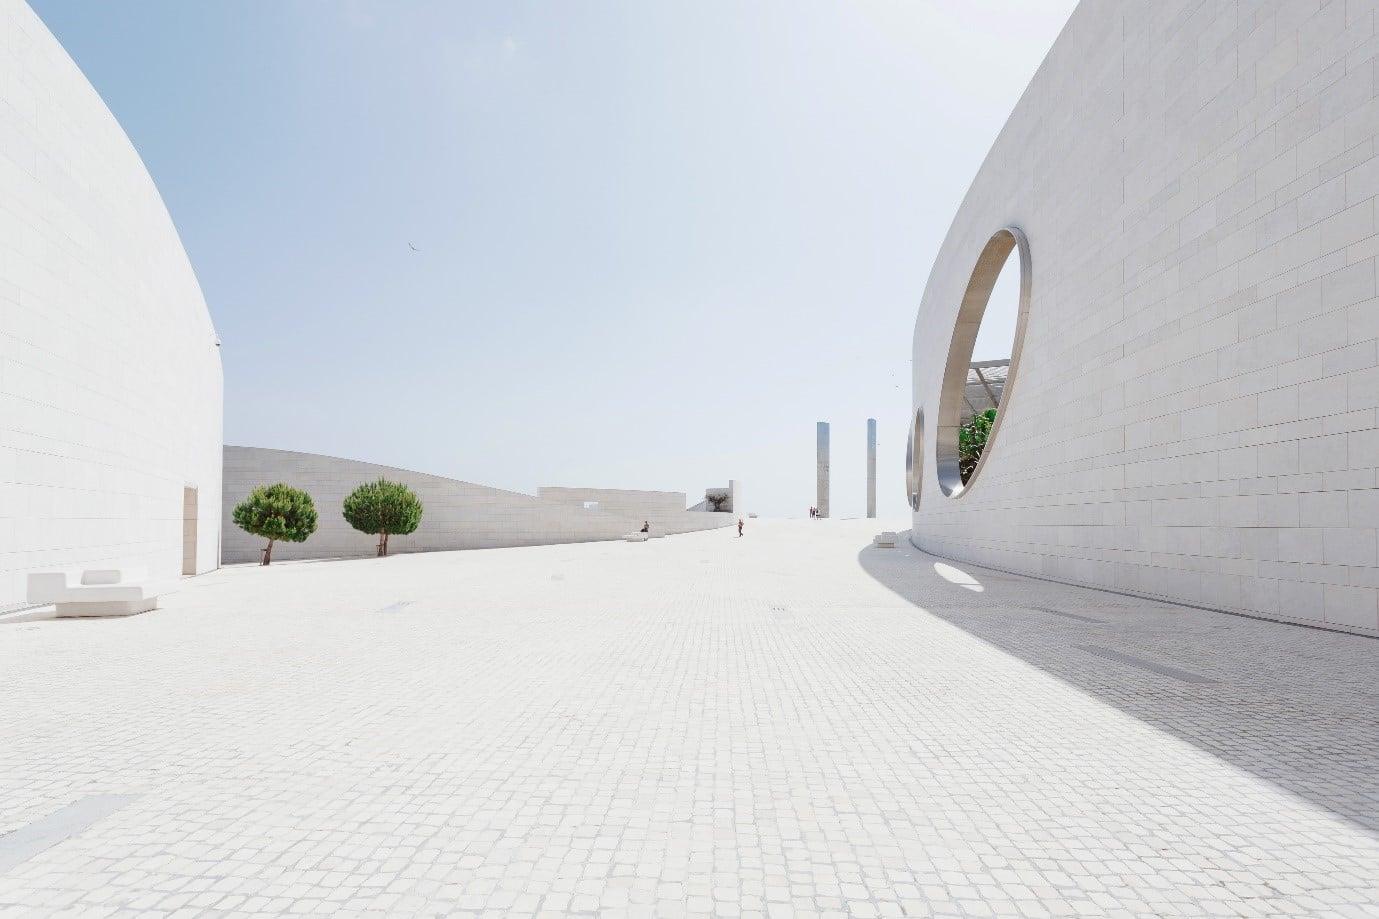 driveway-ideas-white-paved